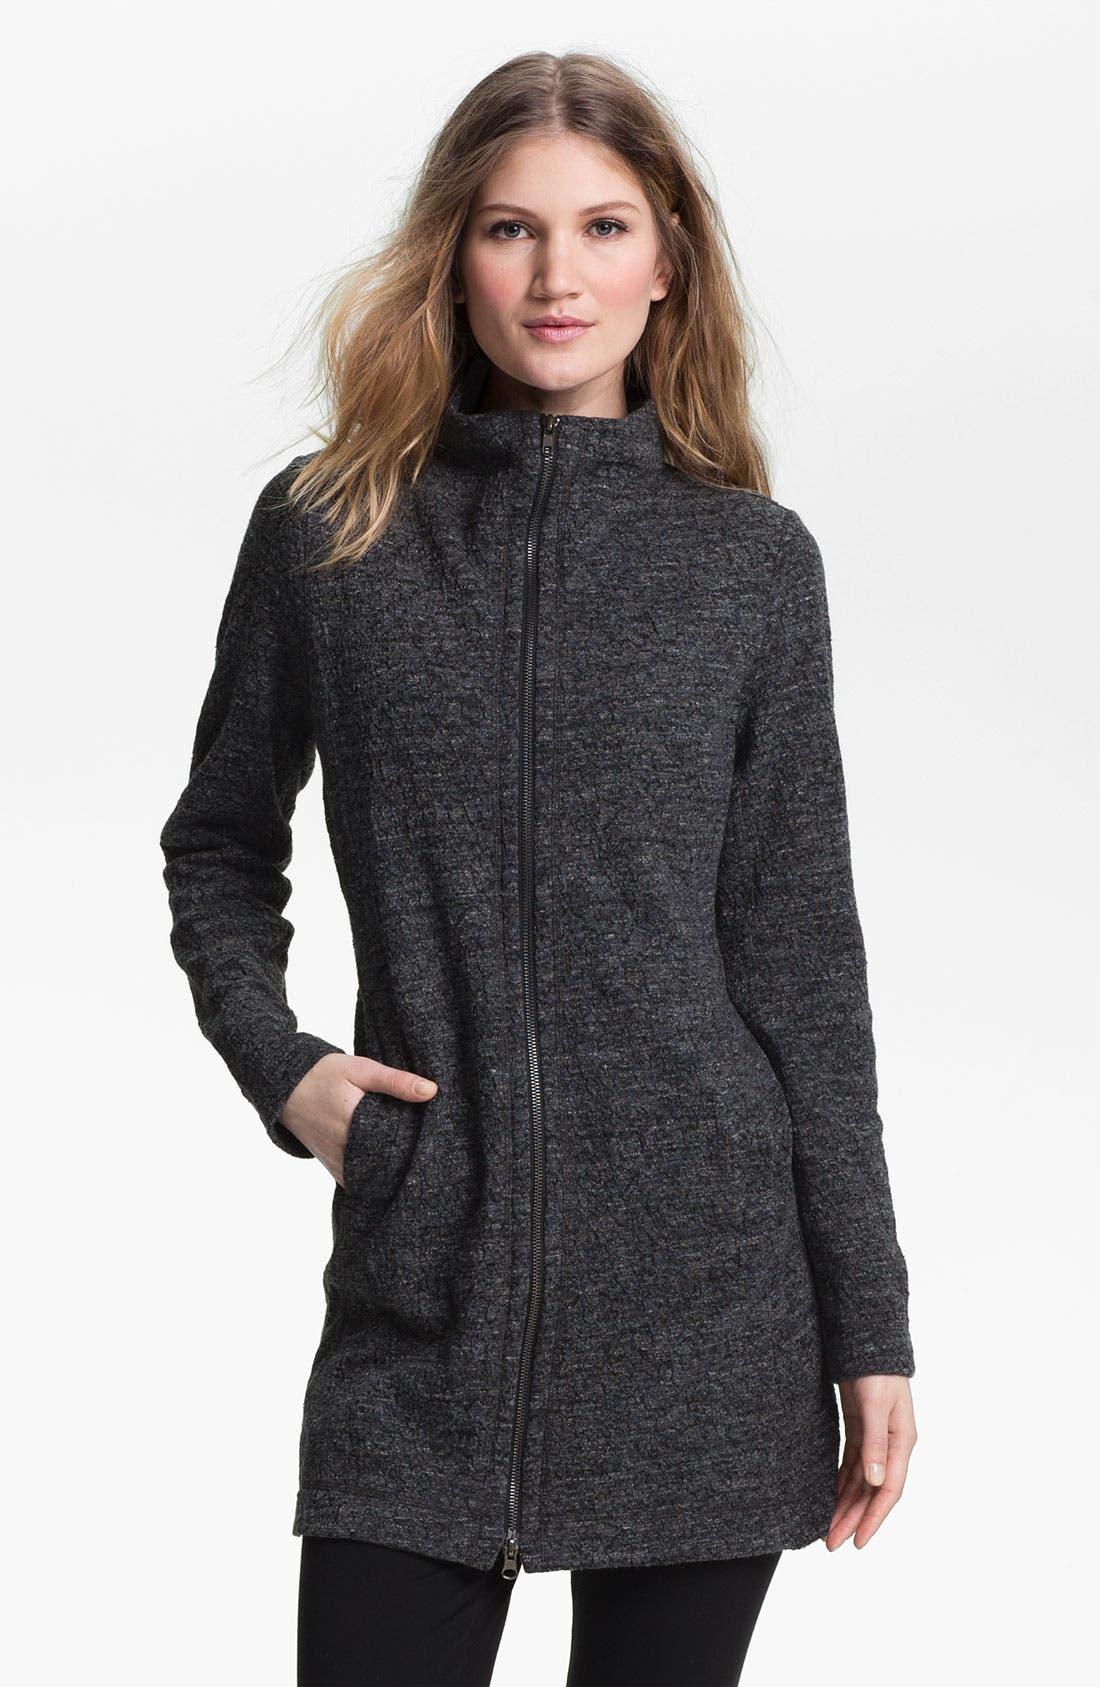 Alternate Image 1 Selected - Eileen Fisher Funnel Neck Zip Jacket (Petite)